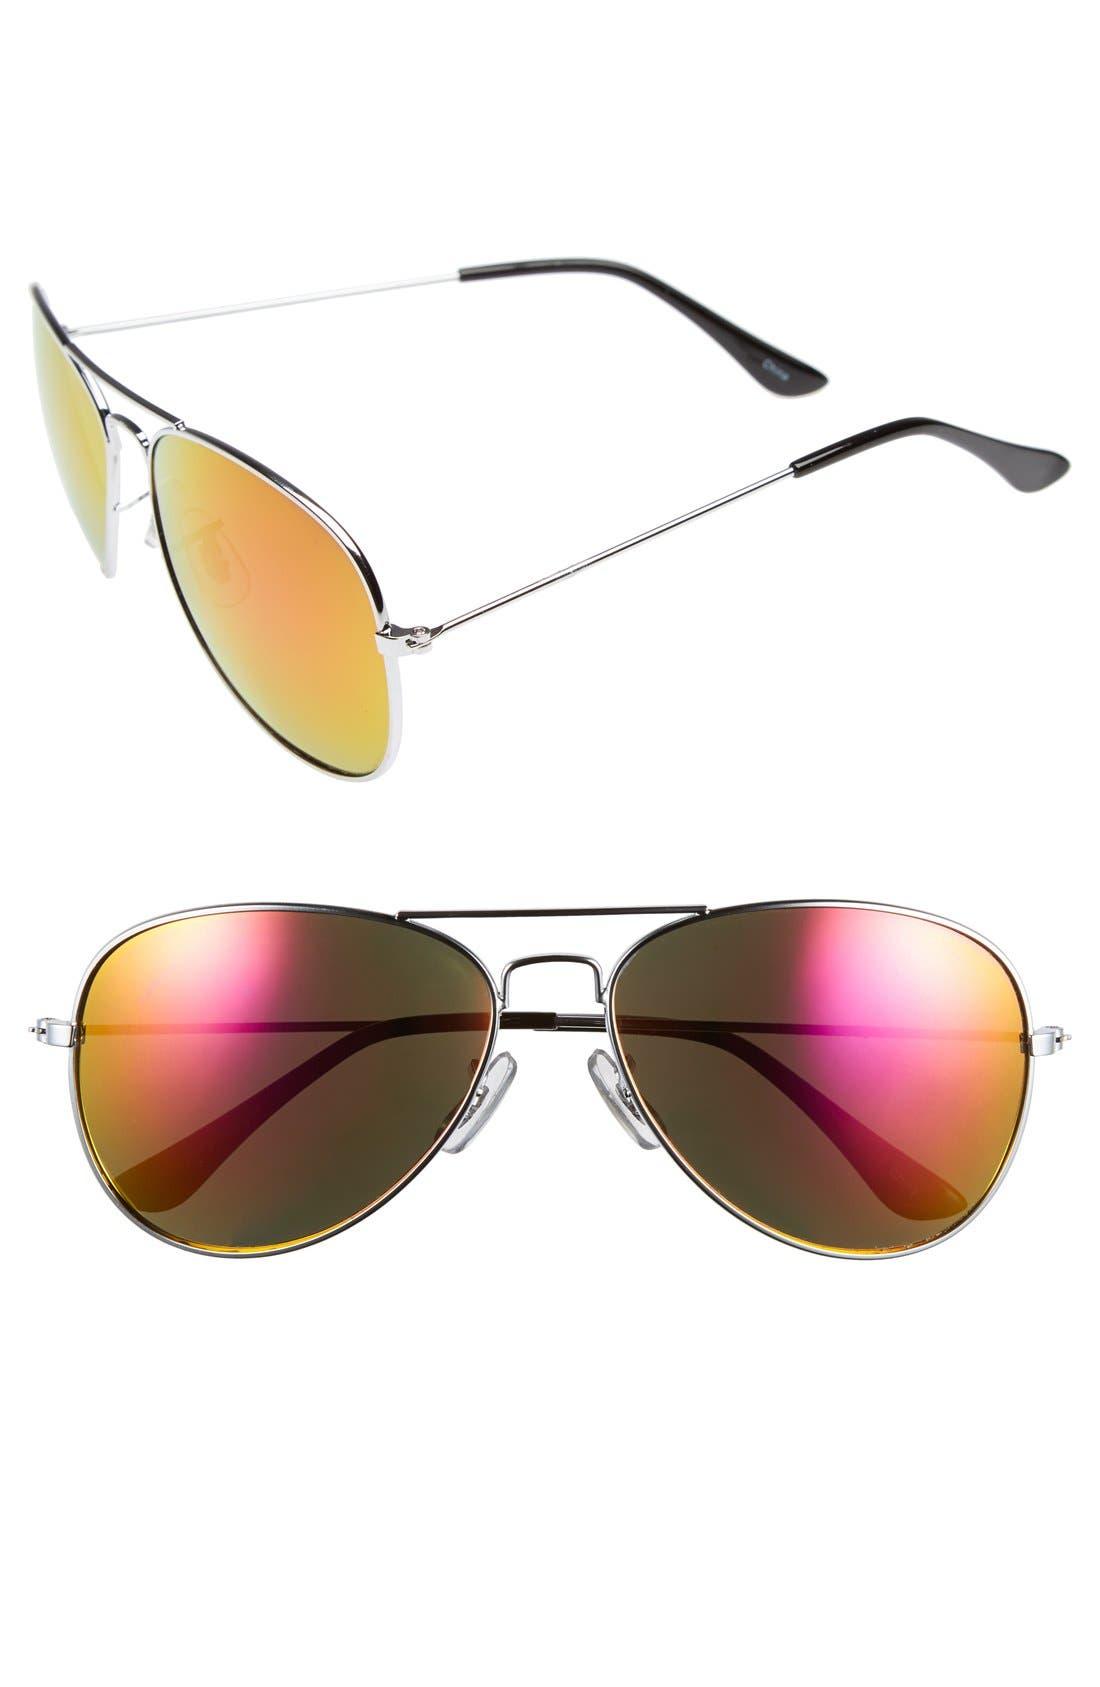 55mm Mirrored Aviator Sunglasses,                             Main thumbnail 1, color,                             040